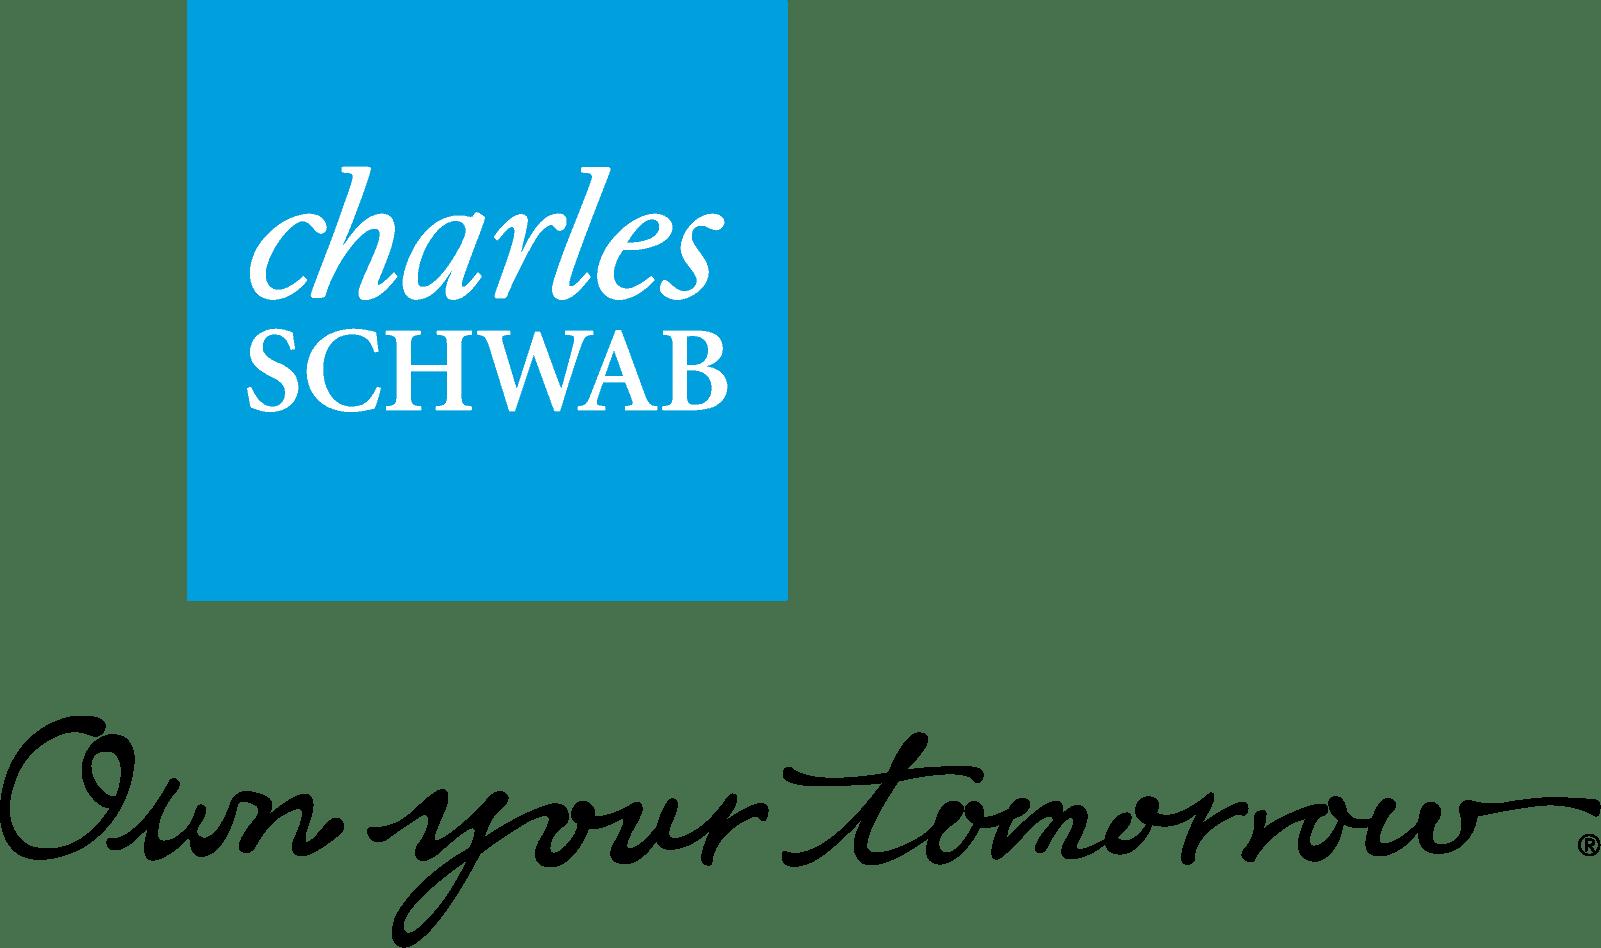 Charles Schwab Diamond Sponsor